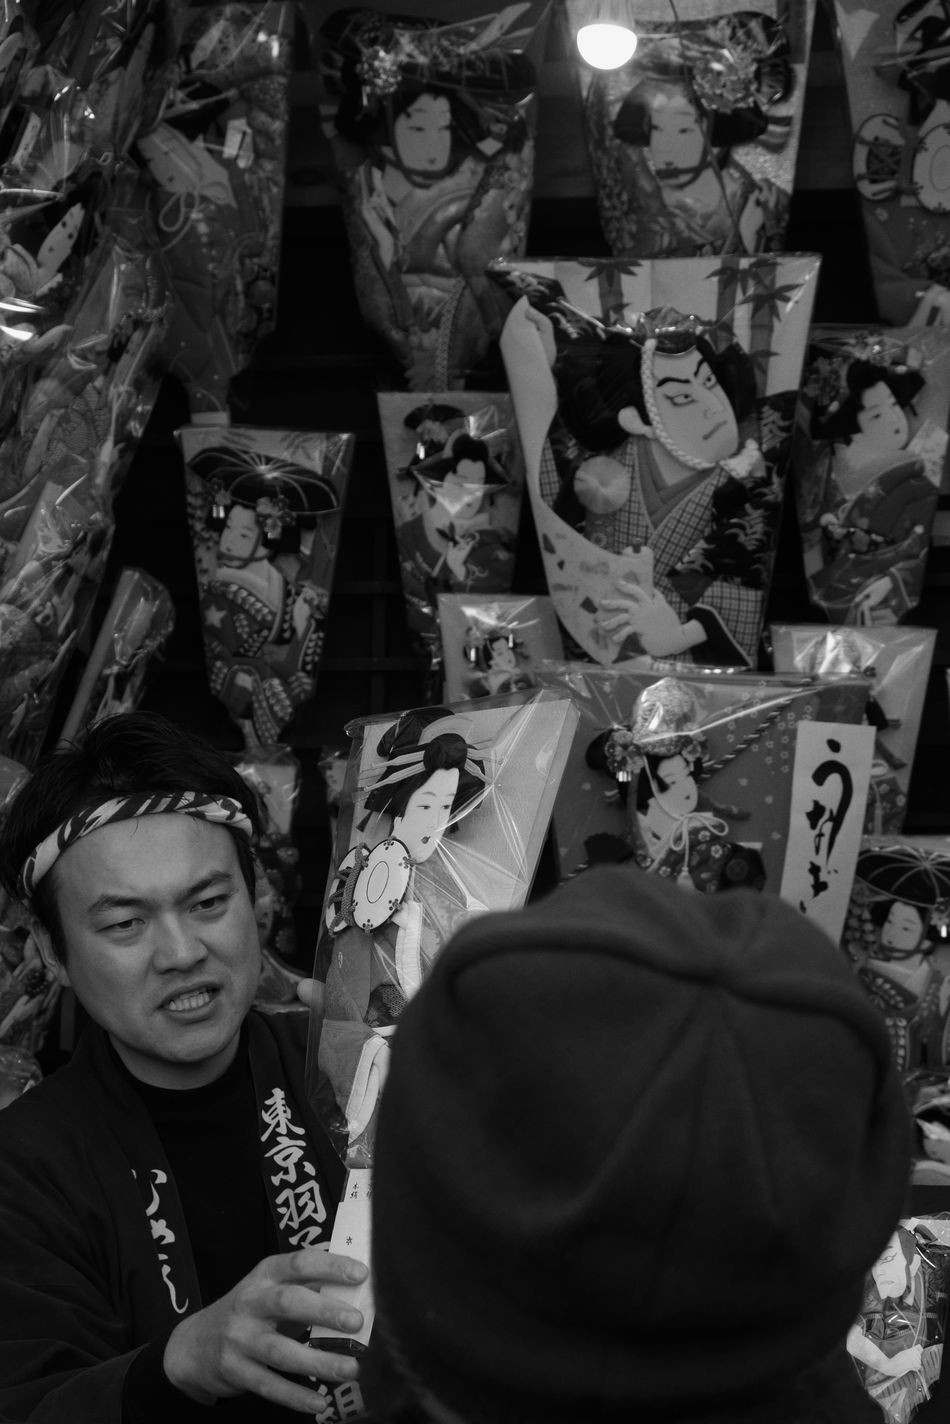 Battledore fair/羽子板市 Dedicated to Mr. Seth Kunin Monochrome Battledore Fair Traditional Hanging Out Enjoying Life Japan Style I Heart Tokyo My Winter Favorites LUMIX DMC-GX7